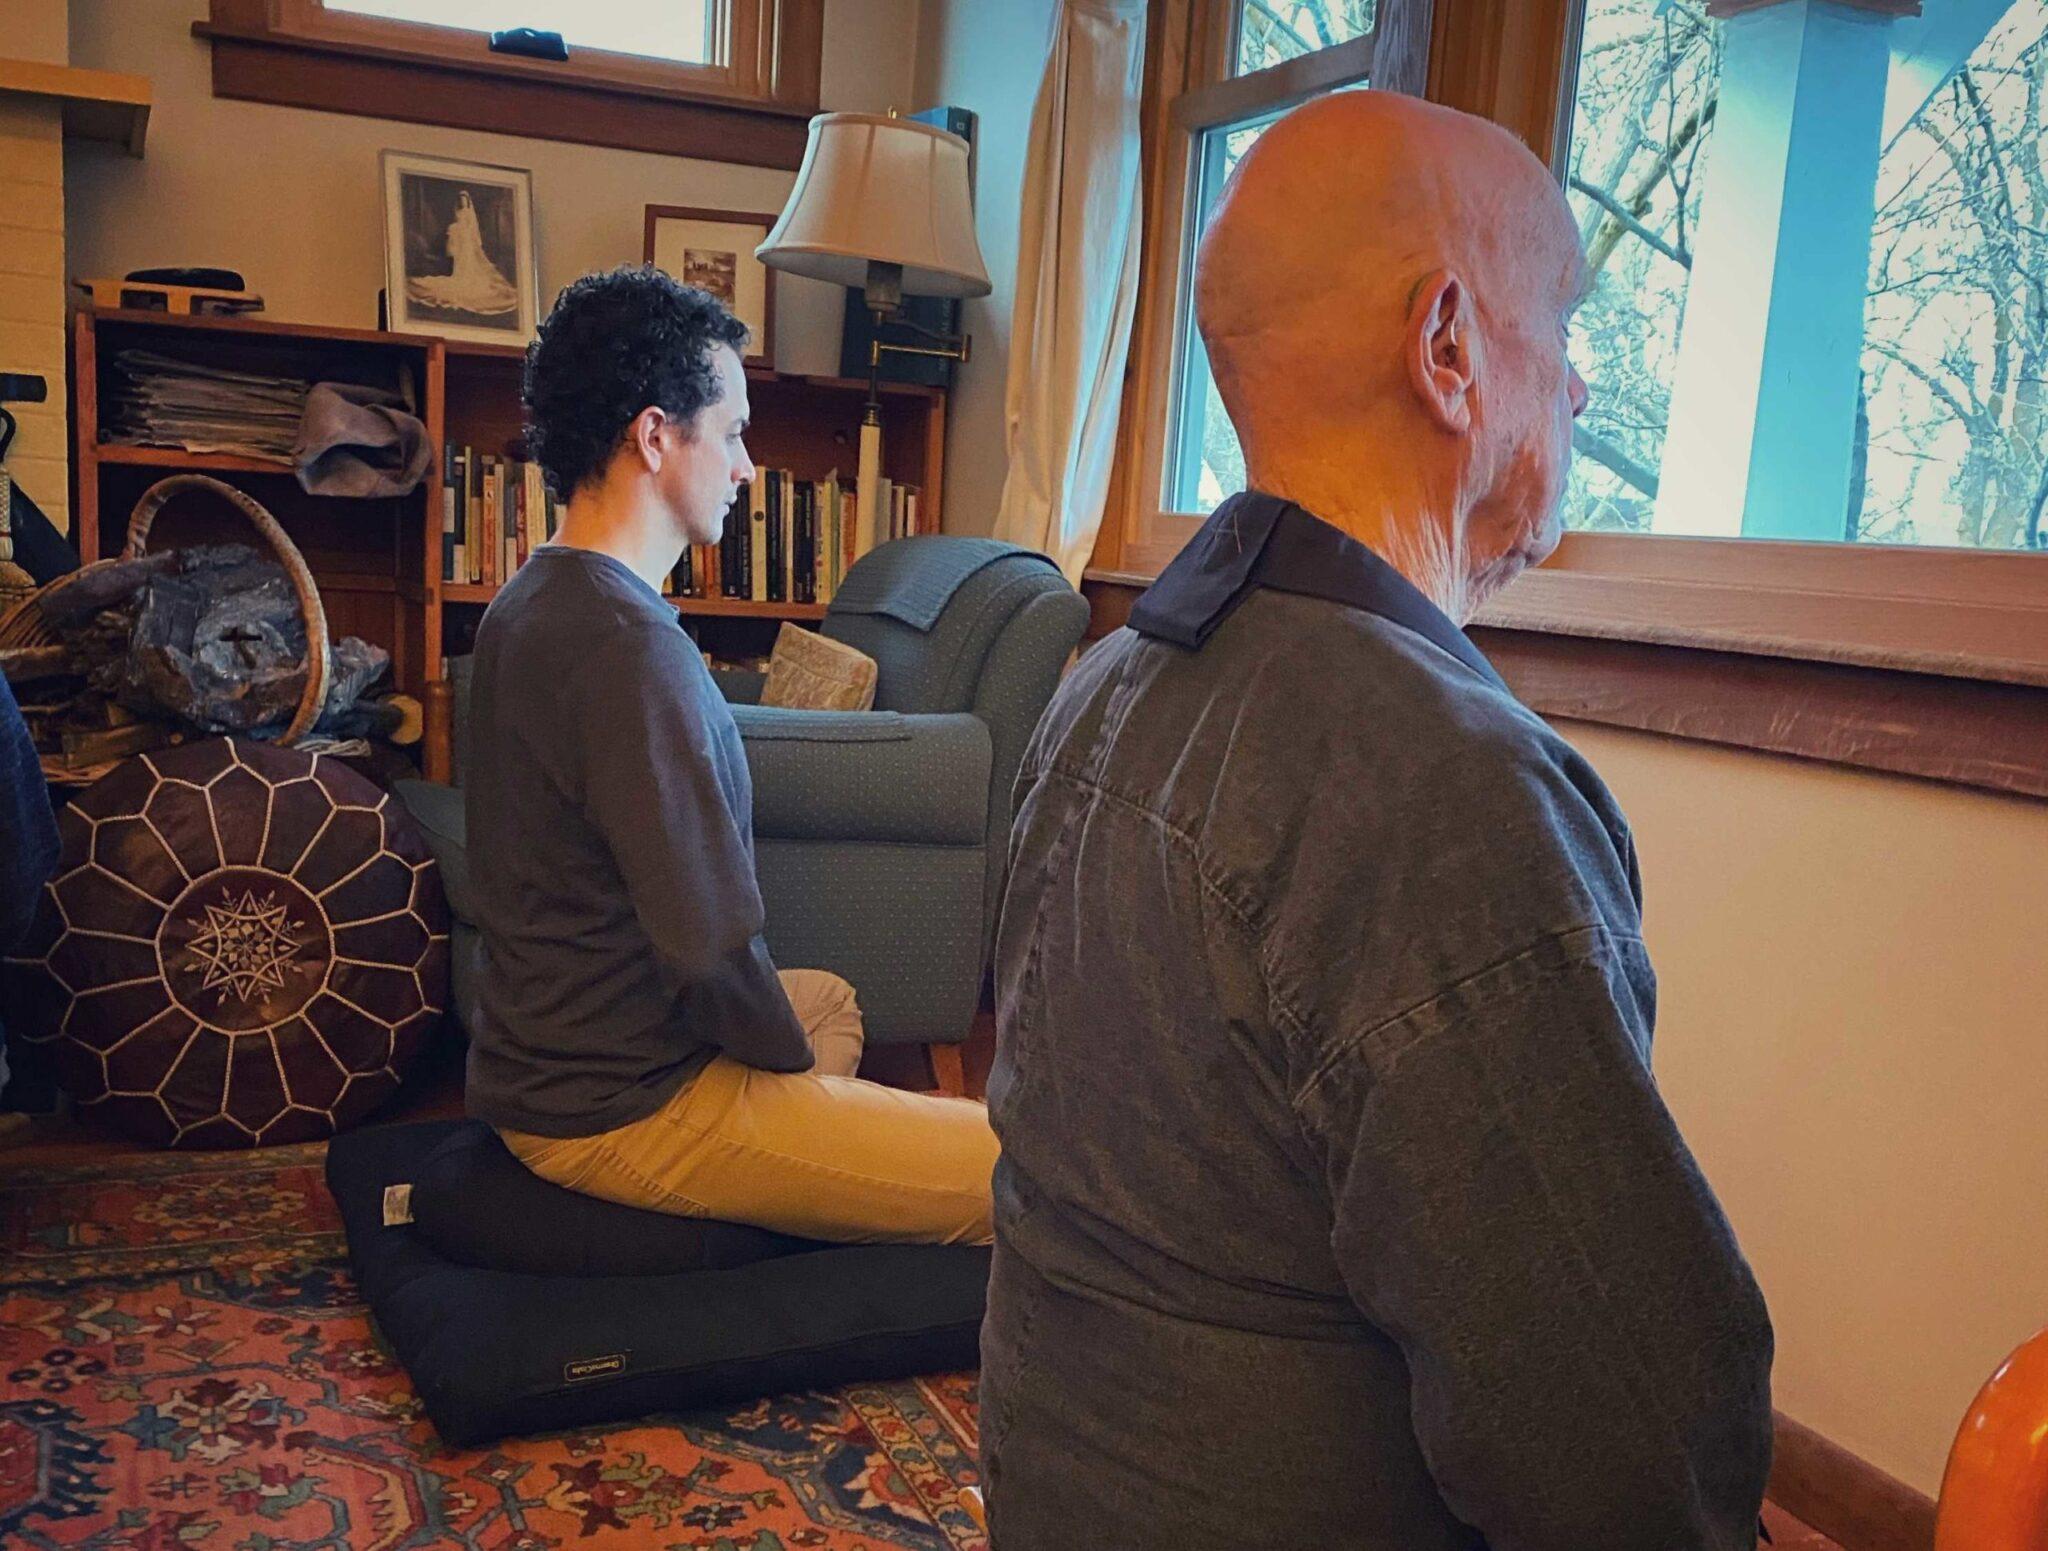 Two people doing yoga meditation.